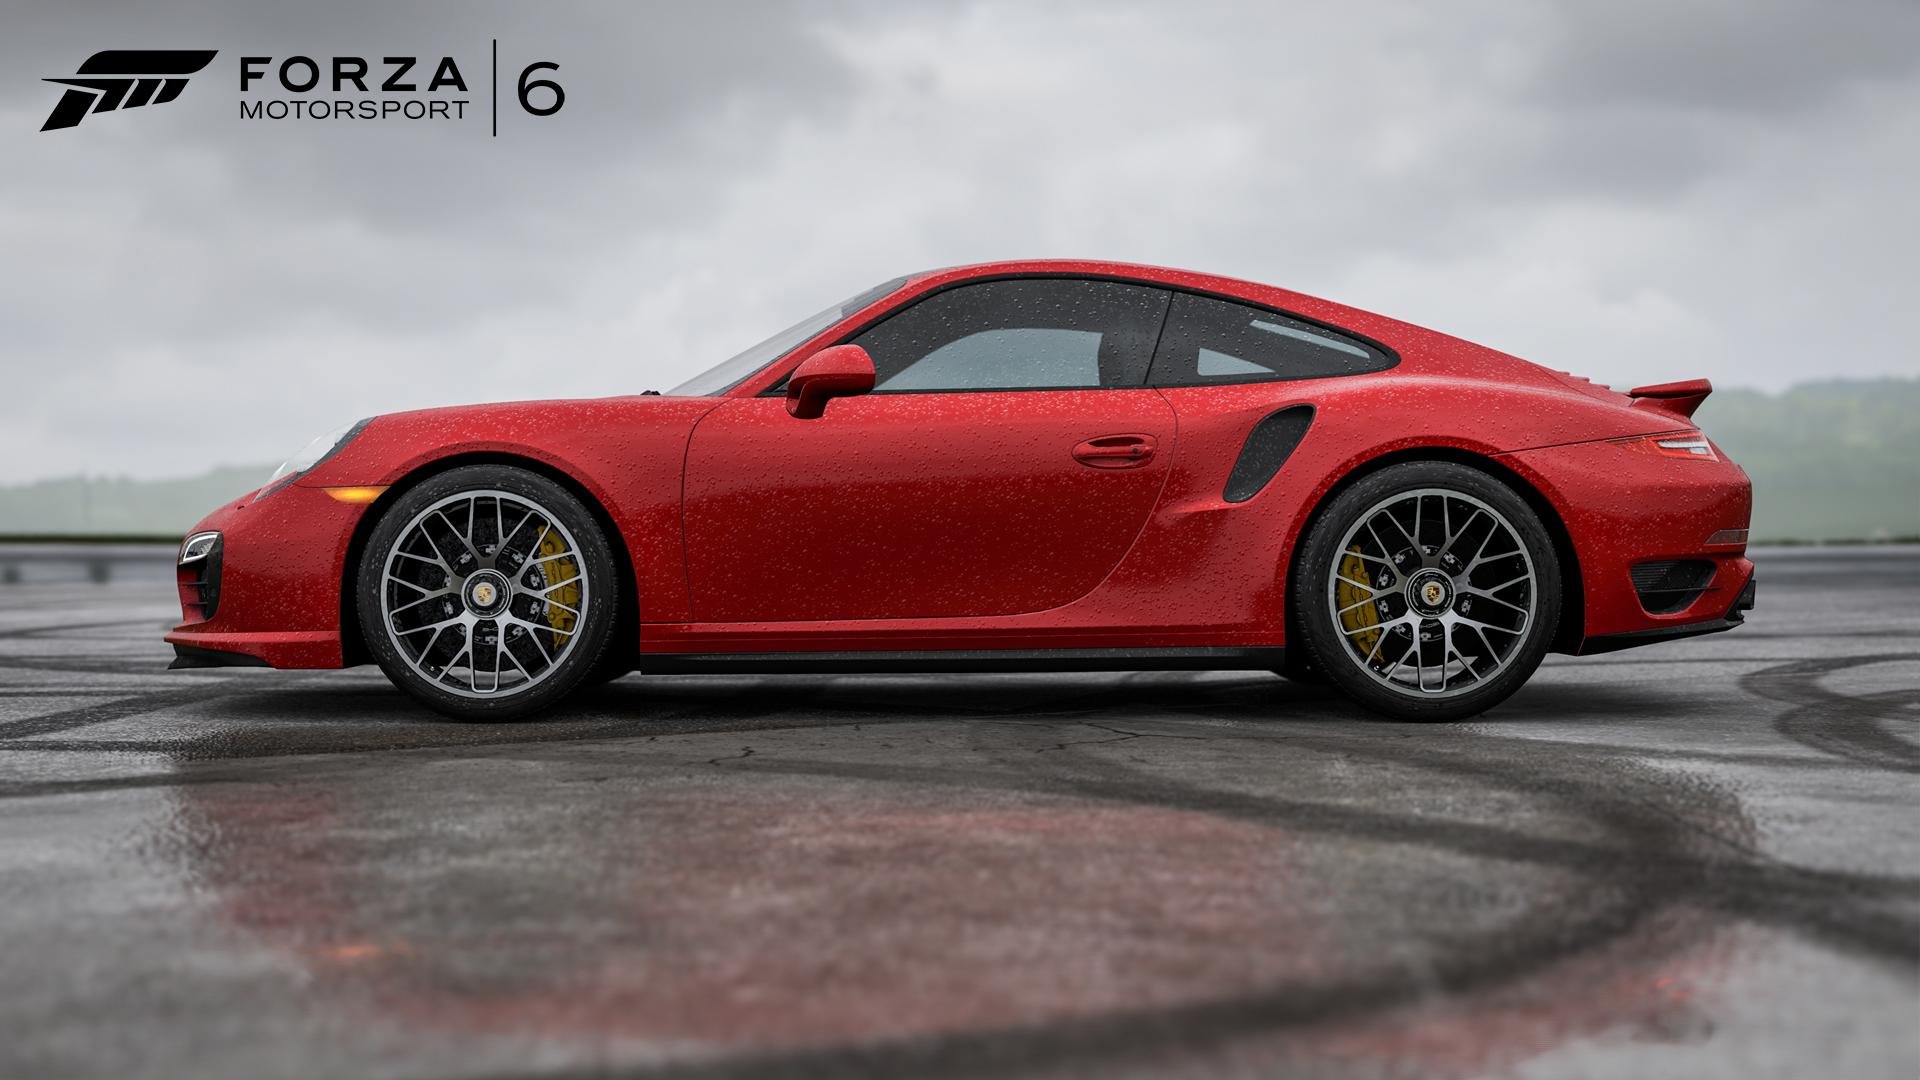 2453d110-27c1-4df9-99de-a36a6cb13cb3.jpg?n=PorscheEXP_POR_911TurboS_14_Forza6_WM Remarkable Porsche 911 Gt2 Xbox 360 Cars Trend